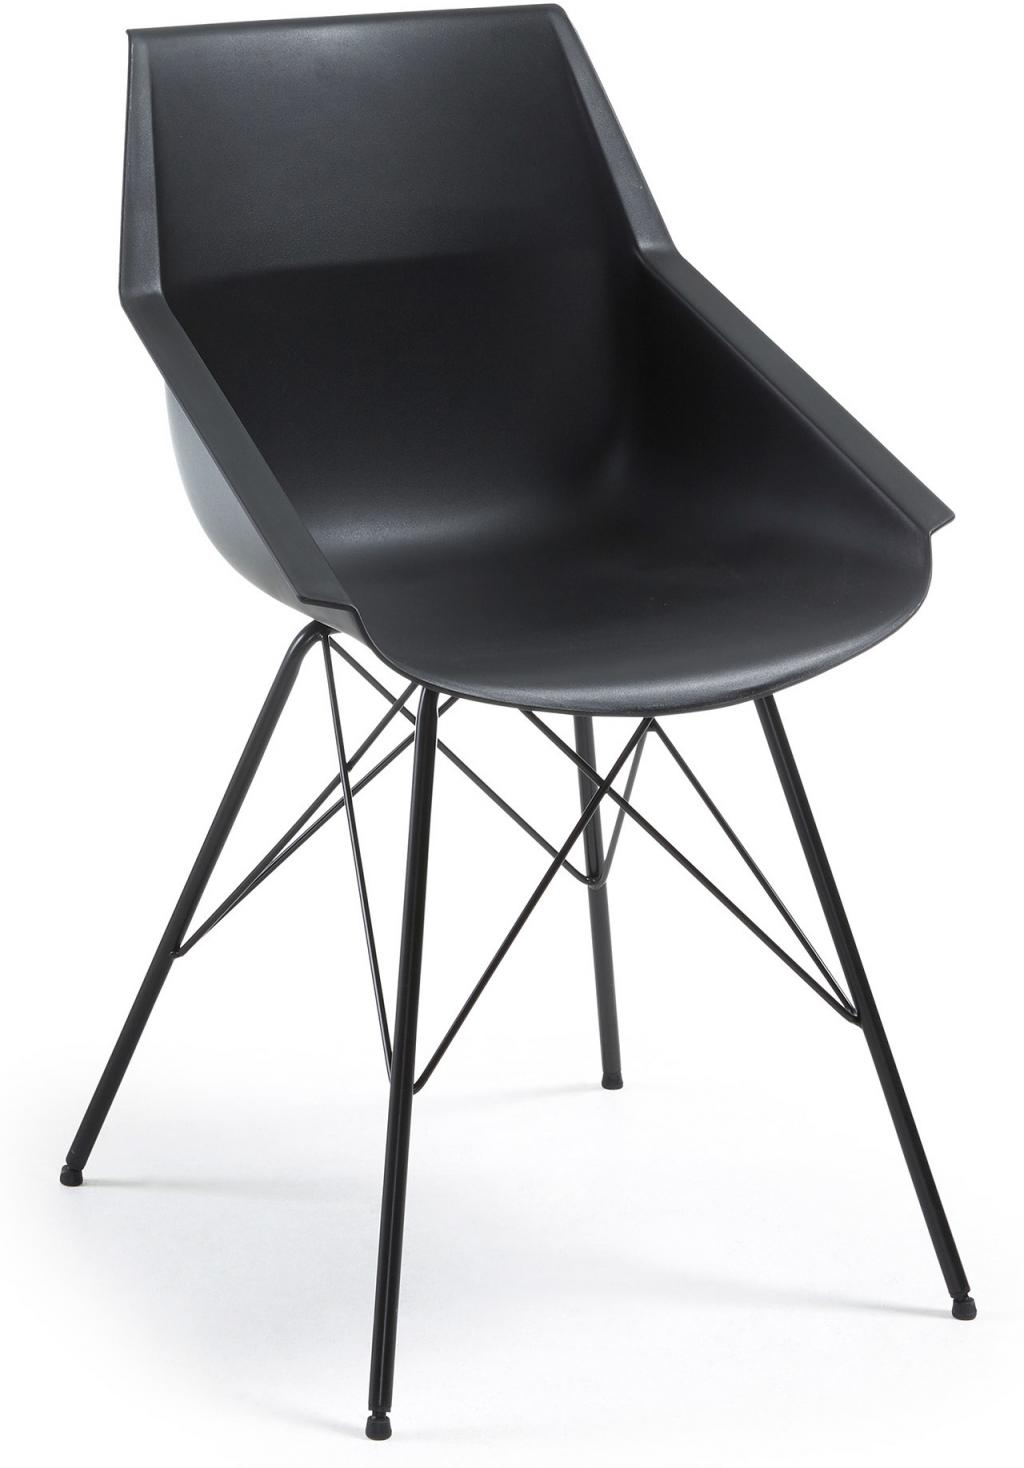 laforma esszimmerstuhl kunn schwarz epoxy kunststoff schale la forma. Black Bedroom Furniture Sets. Home Design Ideas